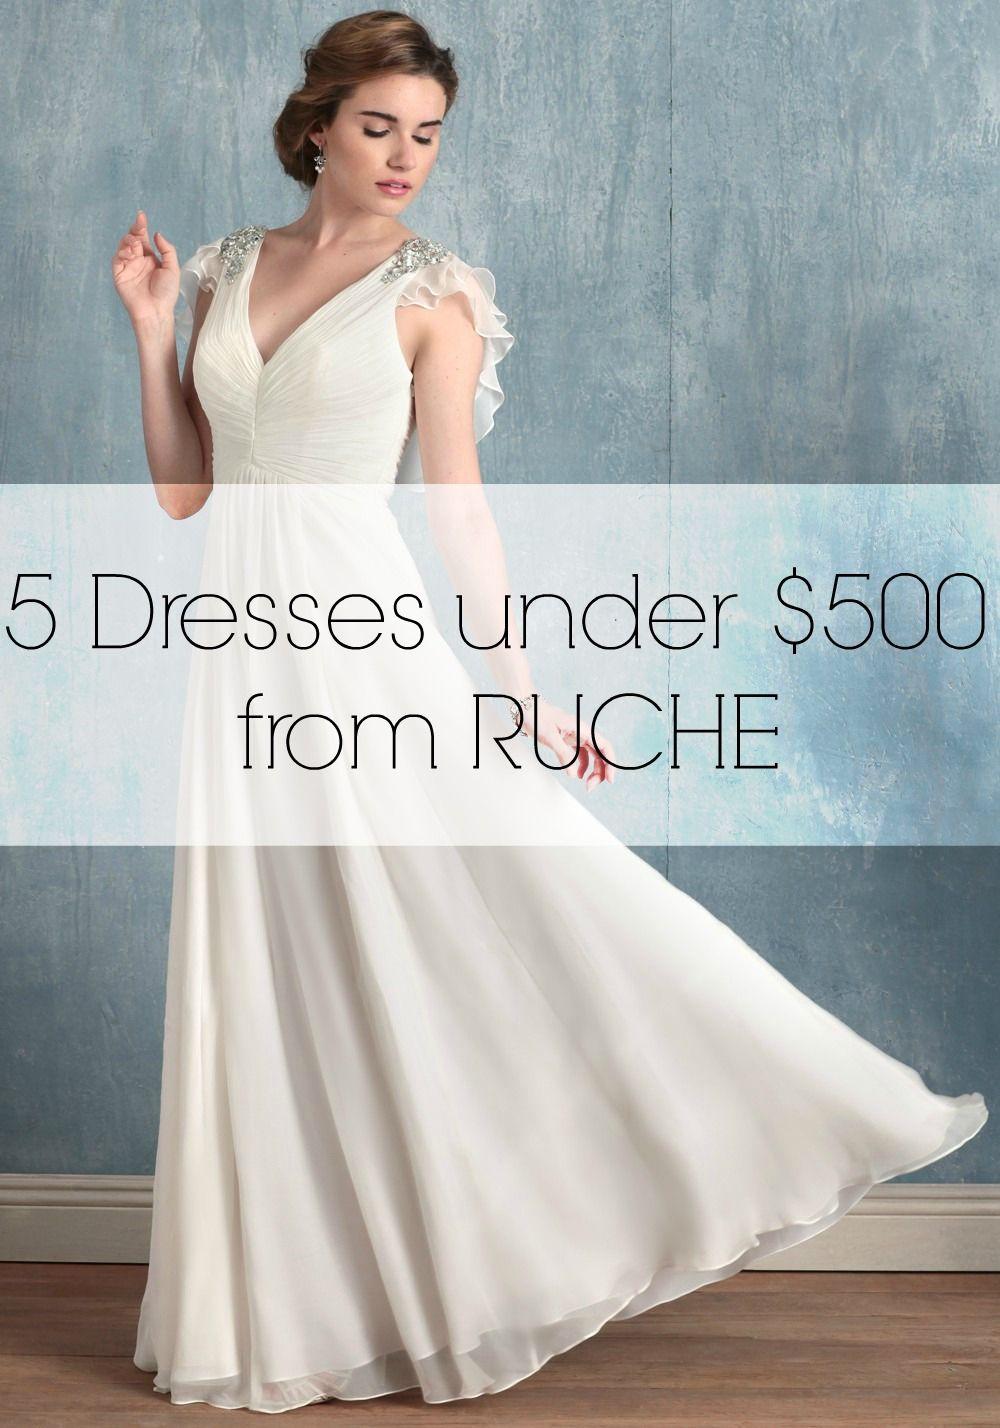 Wedding Dresses for Under 500 Dollars - Wedding Dresses for the ...